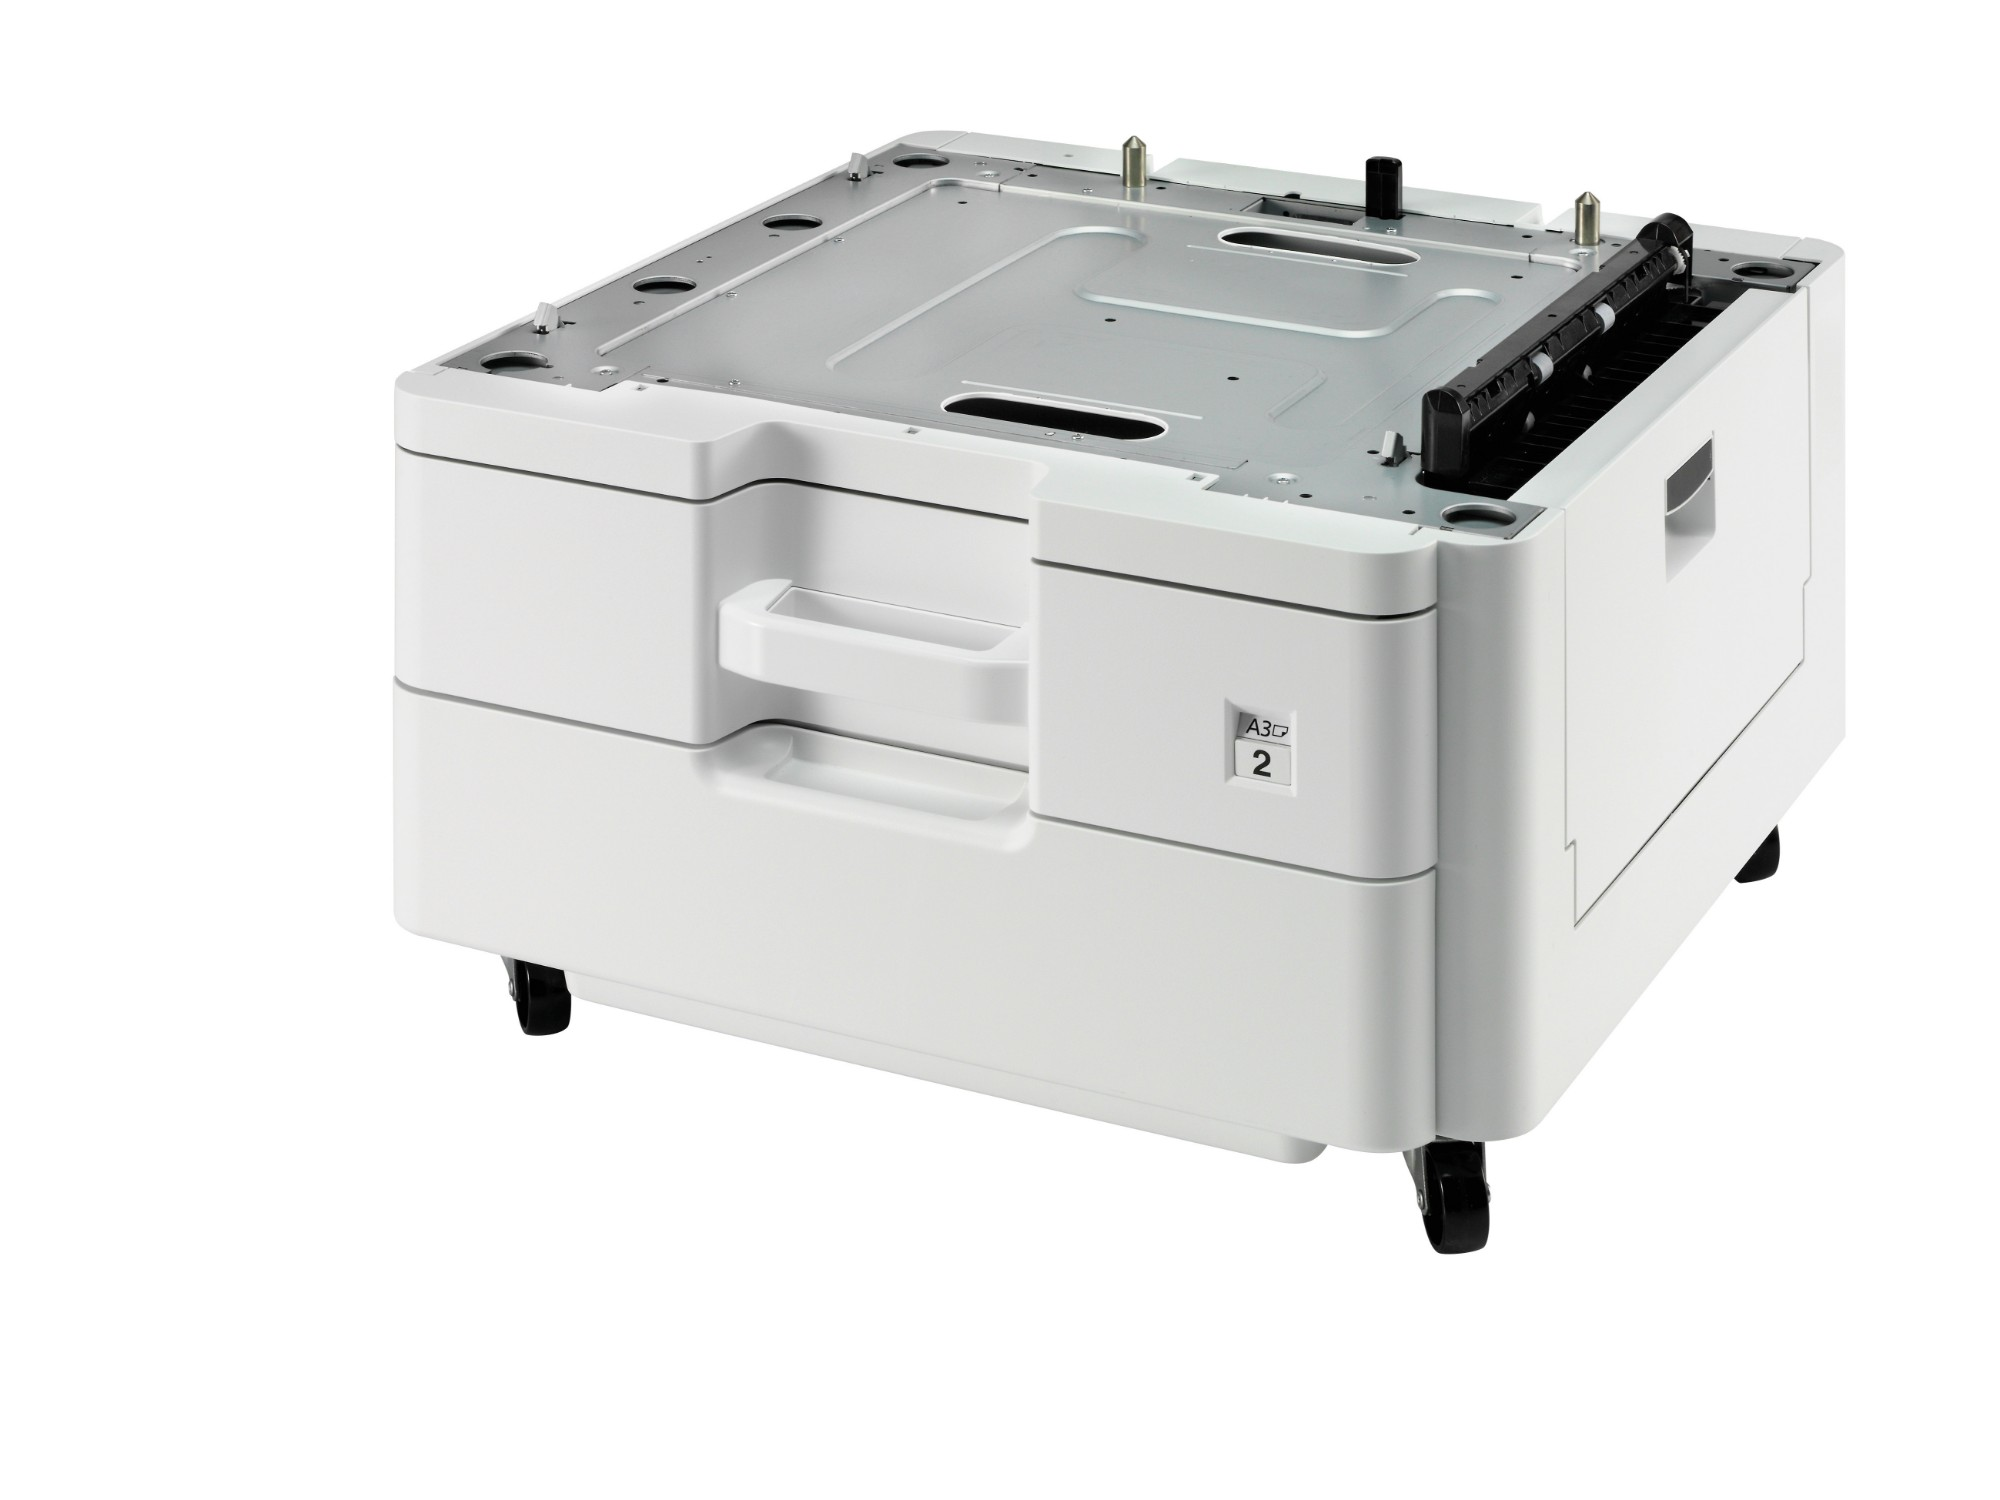 KYOCERA PF-470 500 sheets